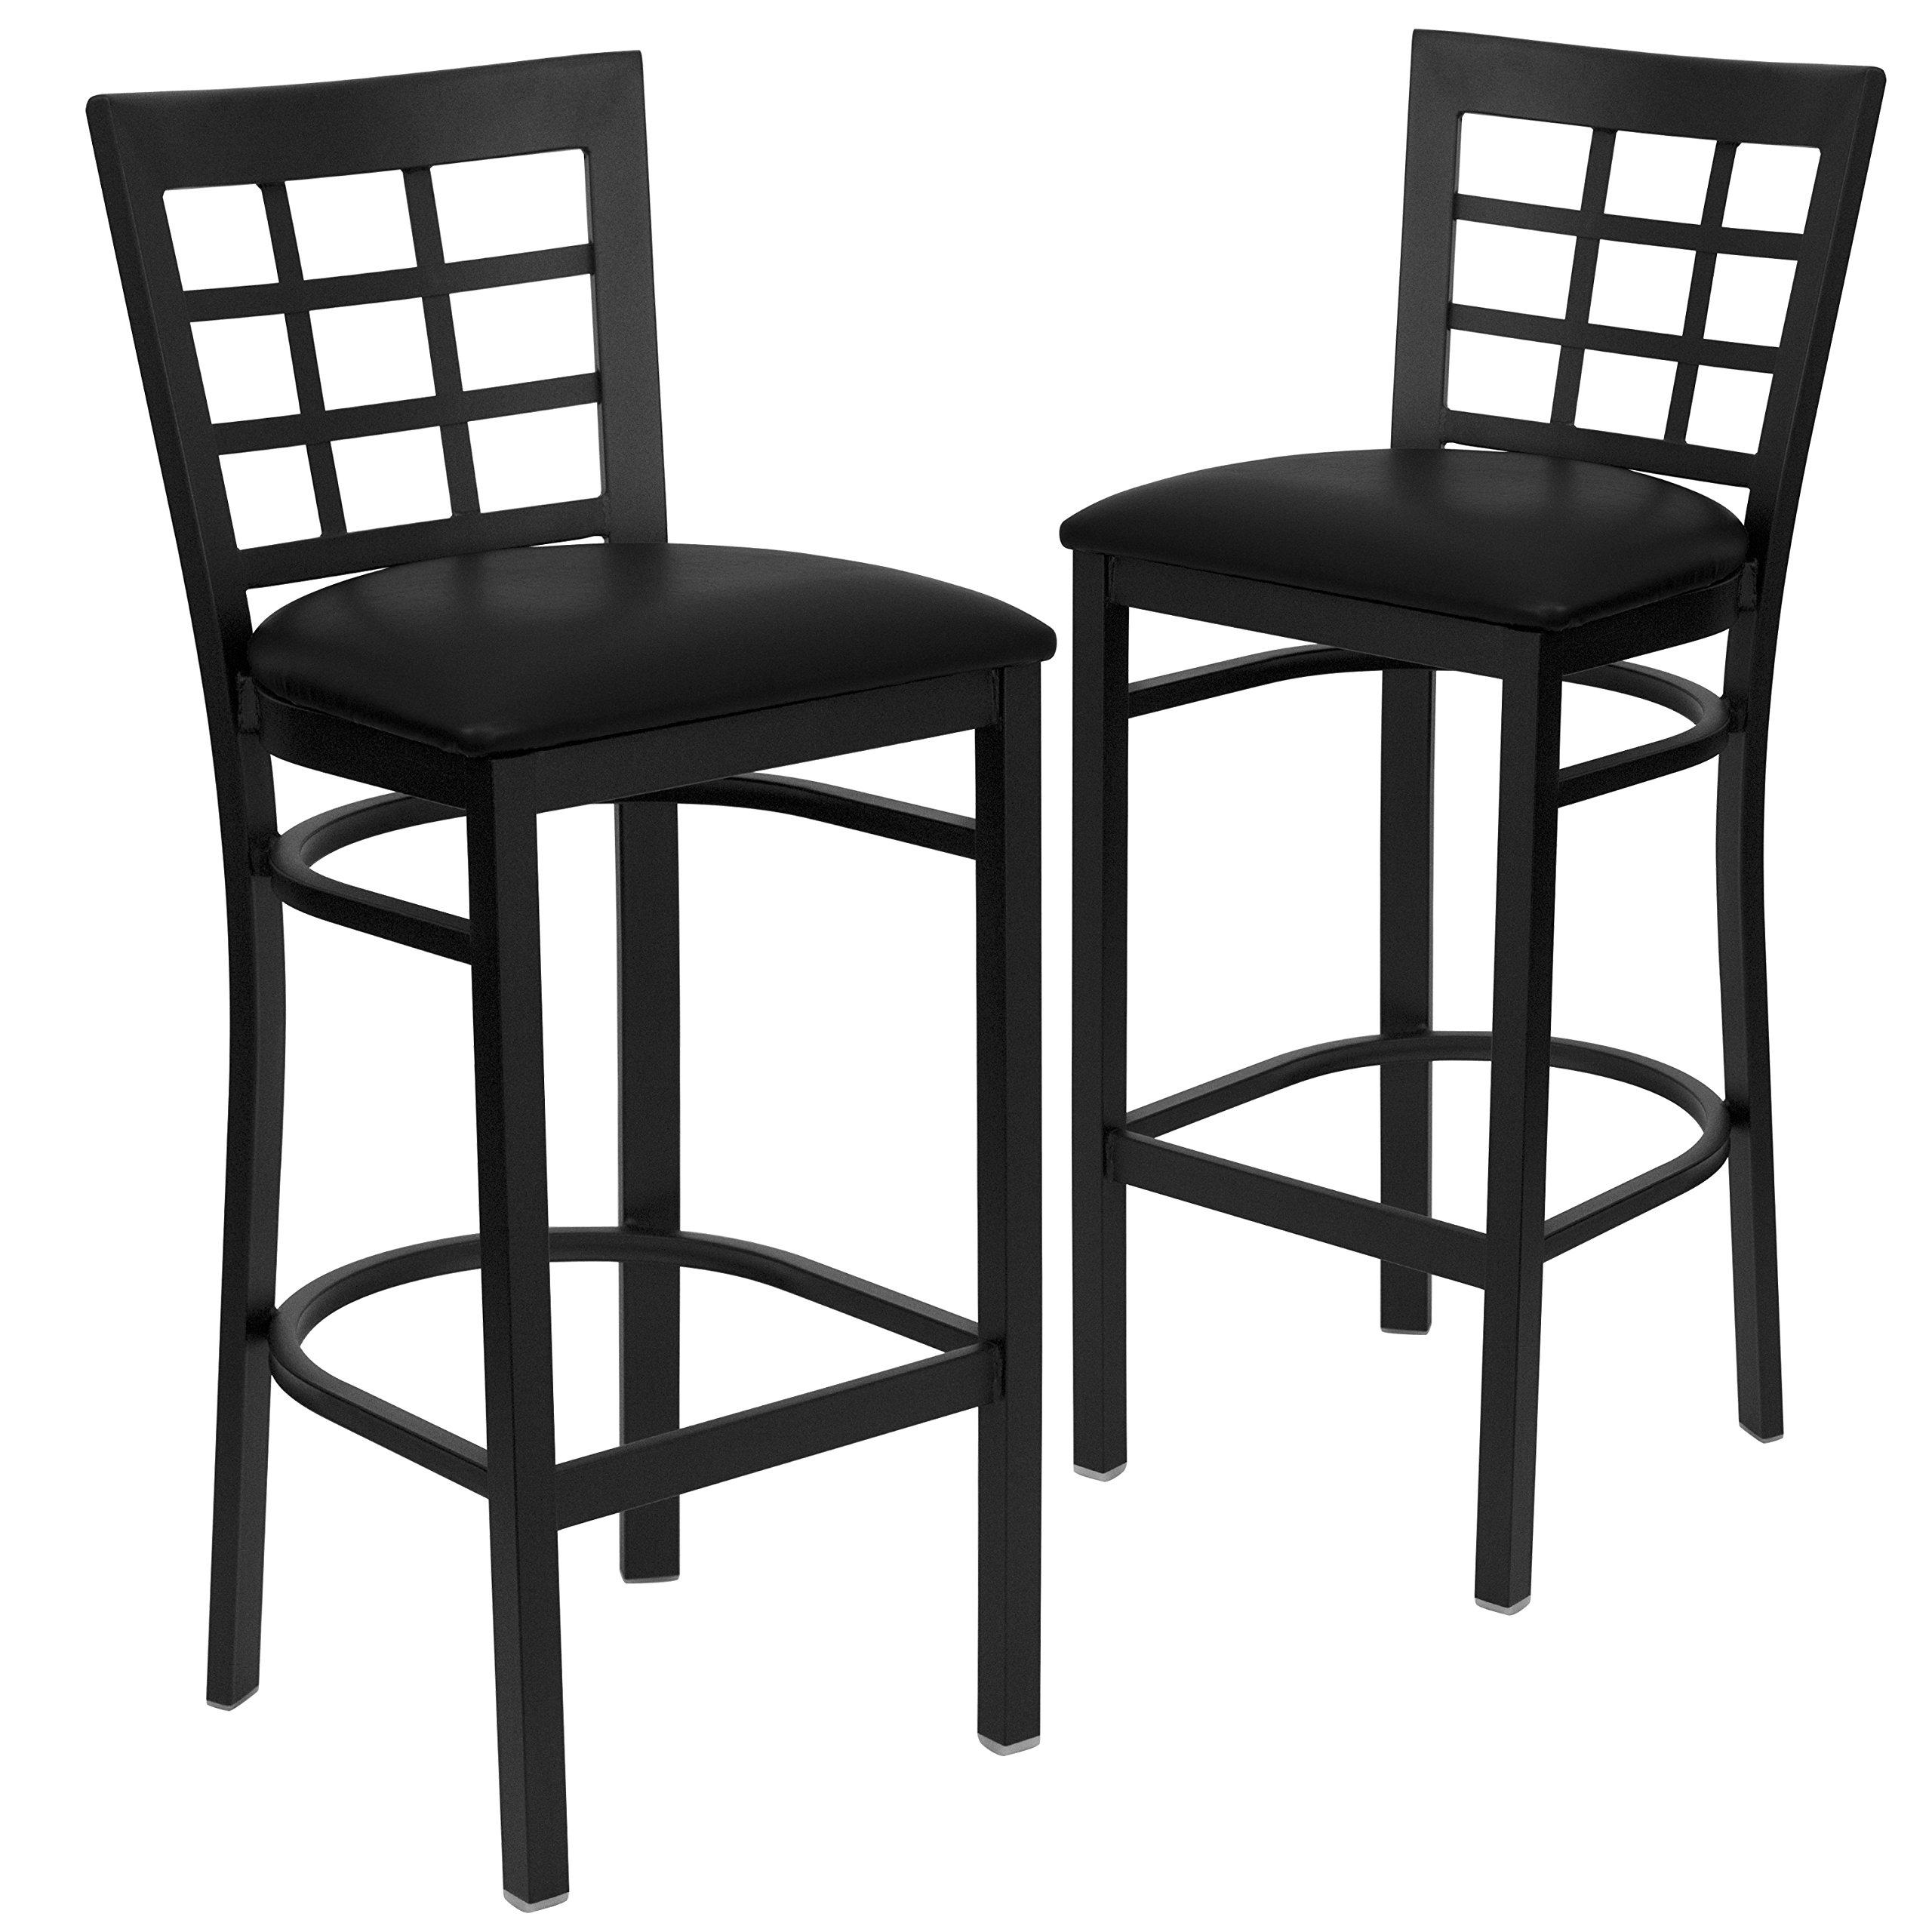 Flash Furniture 2 Pk. HERCULES Series Black Window Back Metal Restaurant Barstool - Black Vinyl Seat